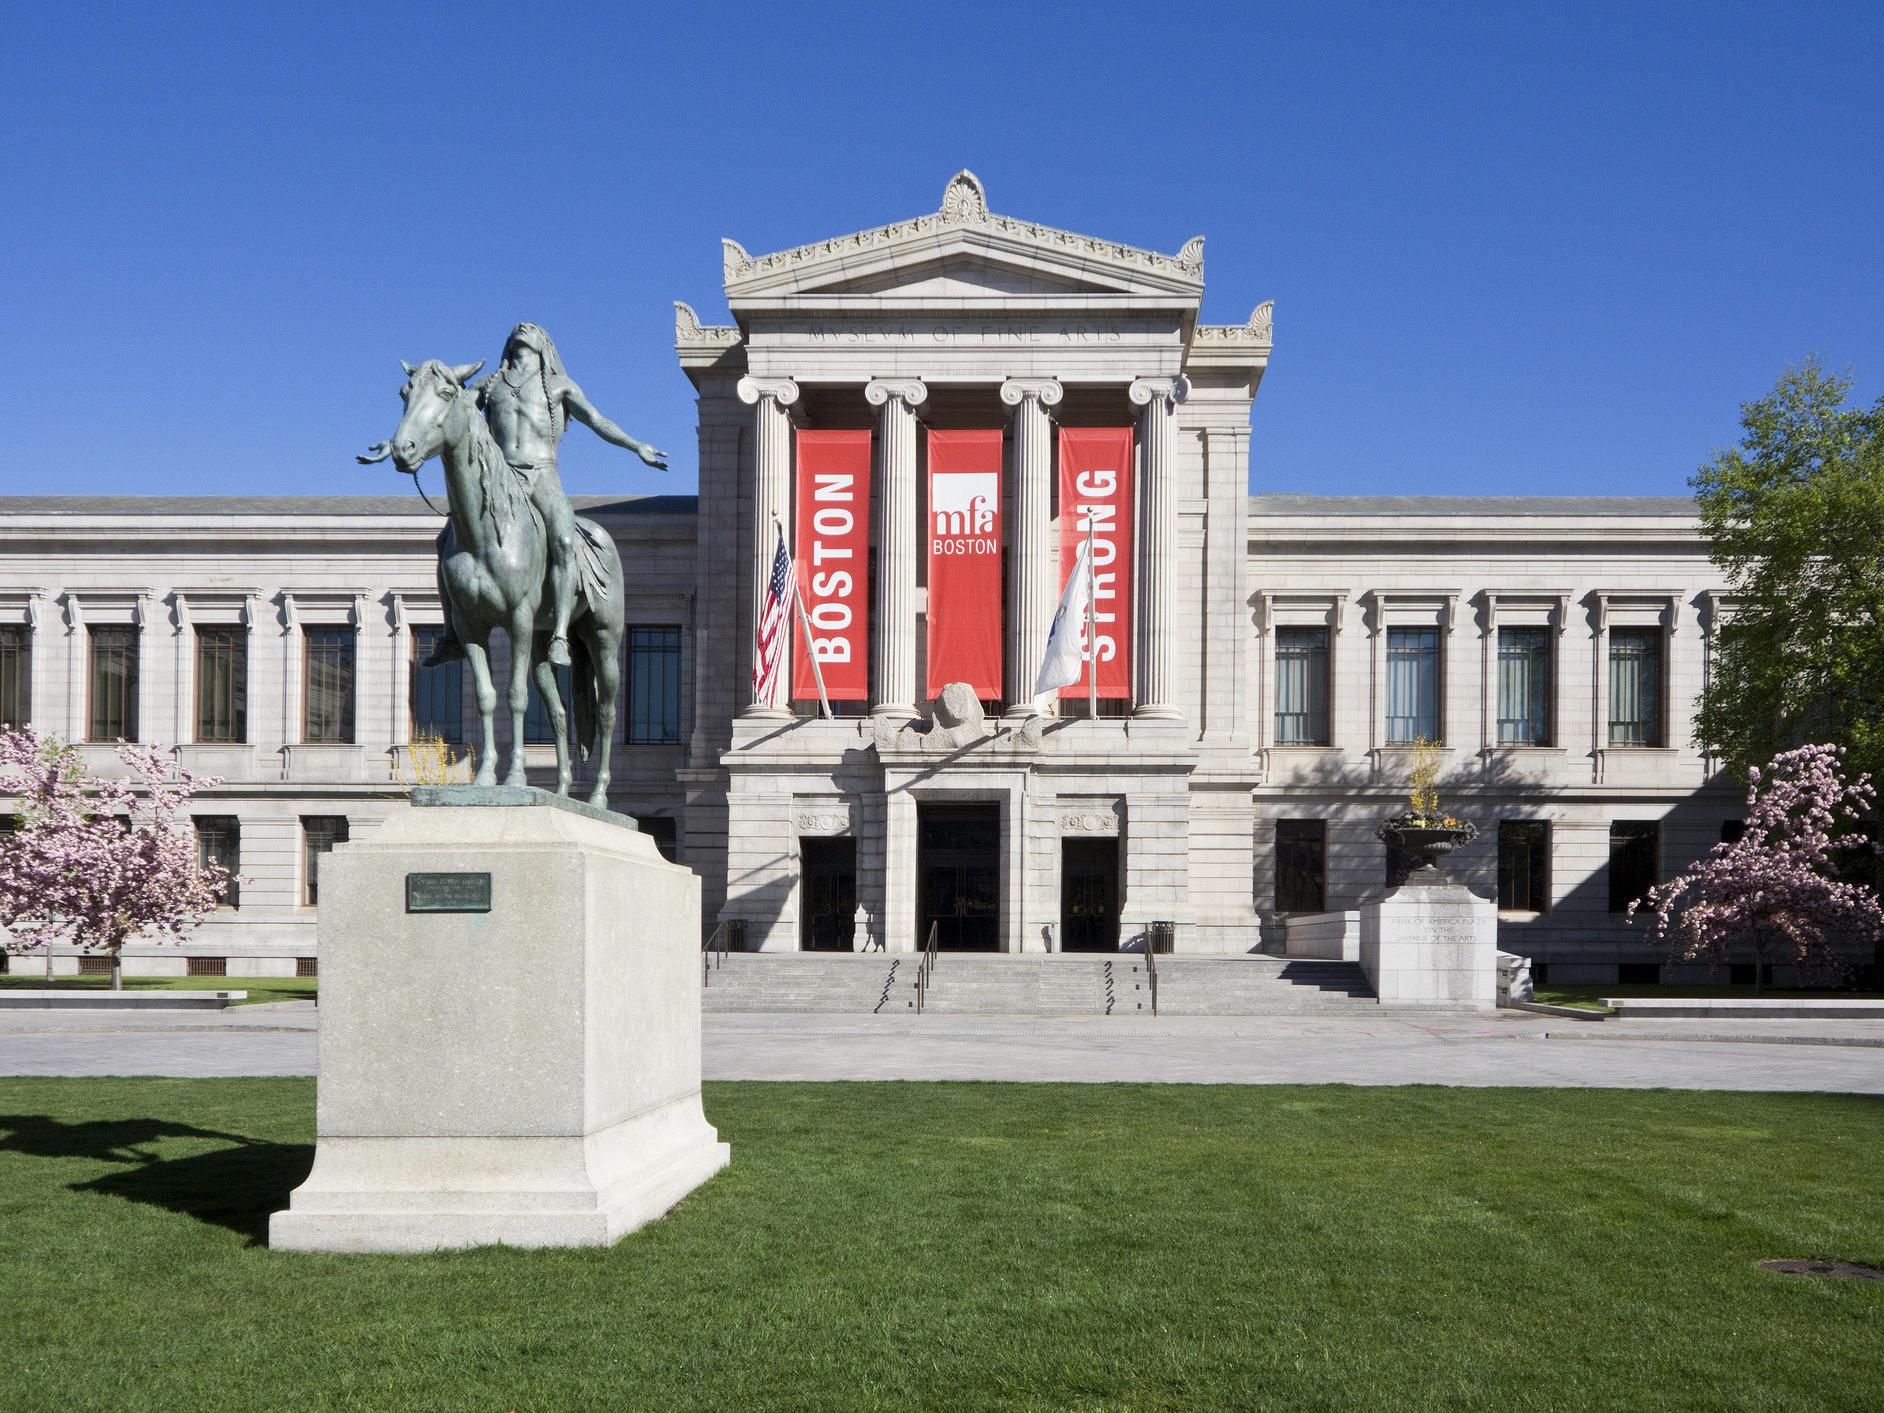 museum in boston